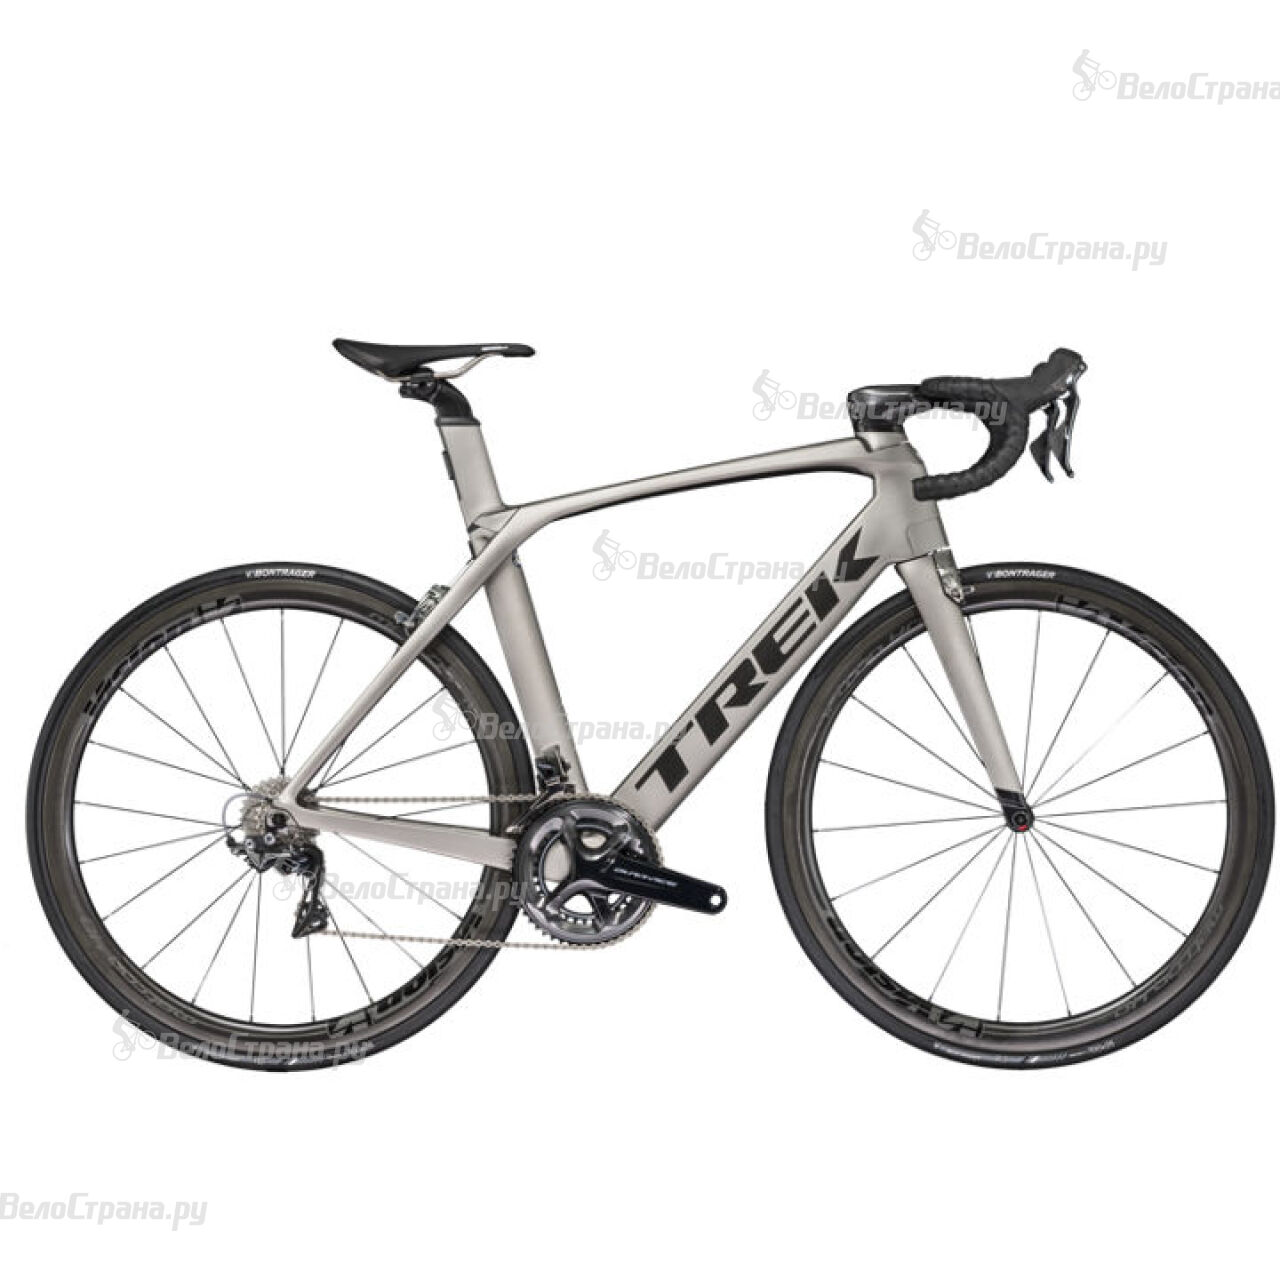 Велосипед Trek MADONE 9.5 C H2 (2017) велосипед trek 1 2 c h2 2013